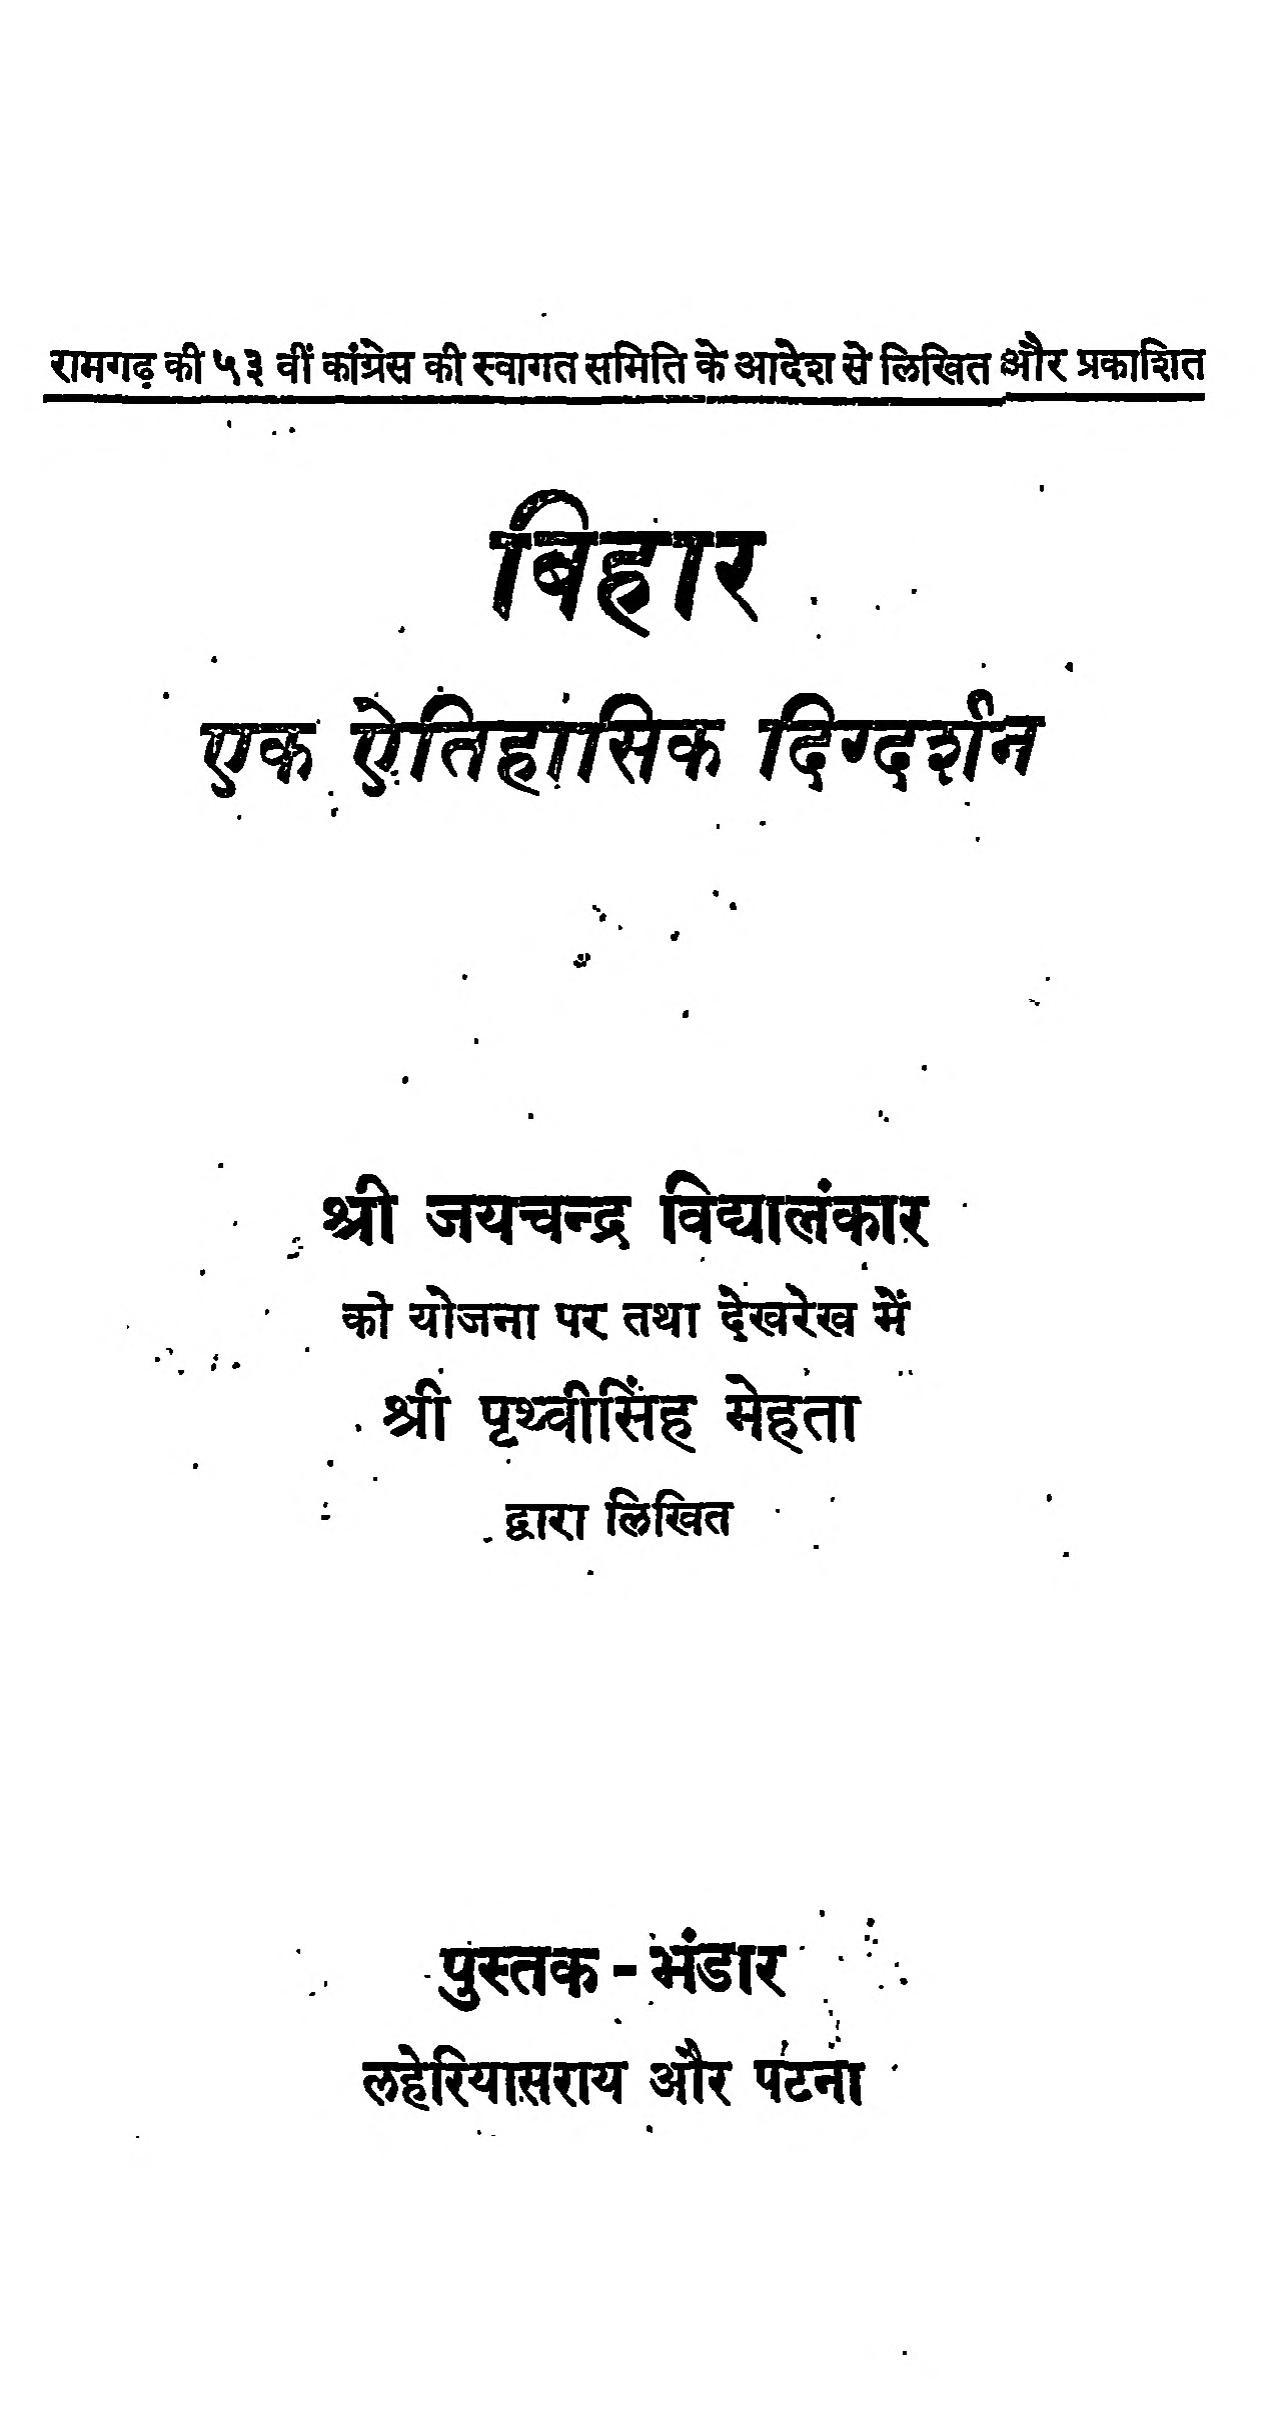 Book Image : बिहार एक ऐतिहासिक दिग्दर्शन - Bihar Ek Aitihasik Digdrshan